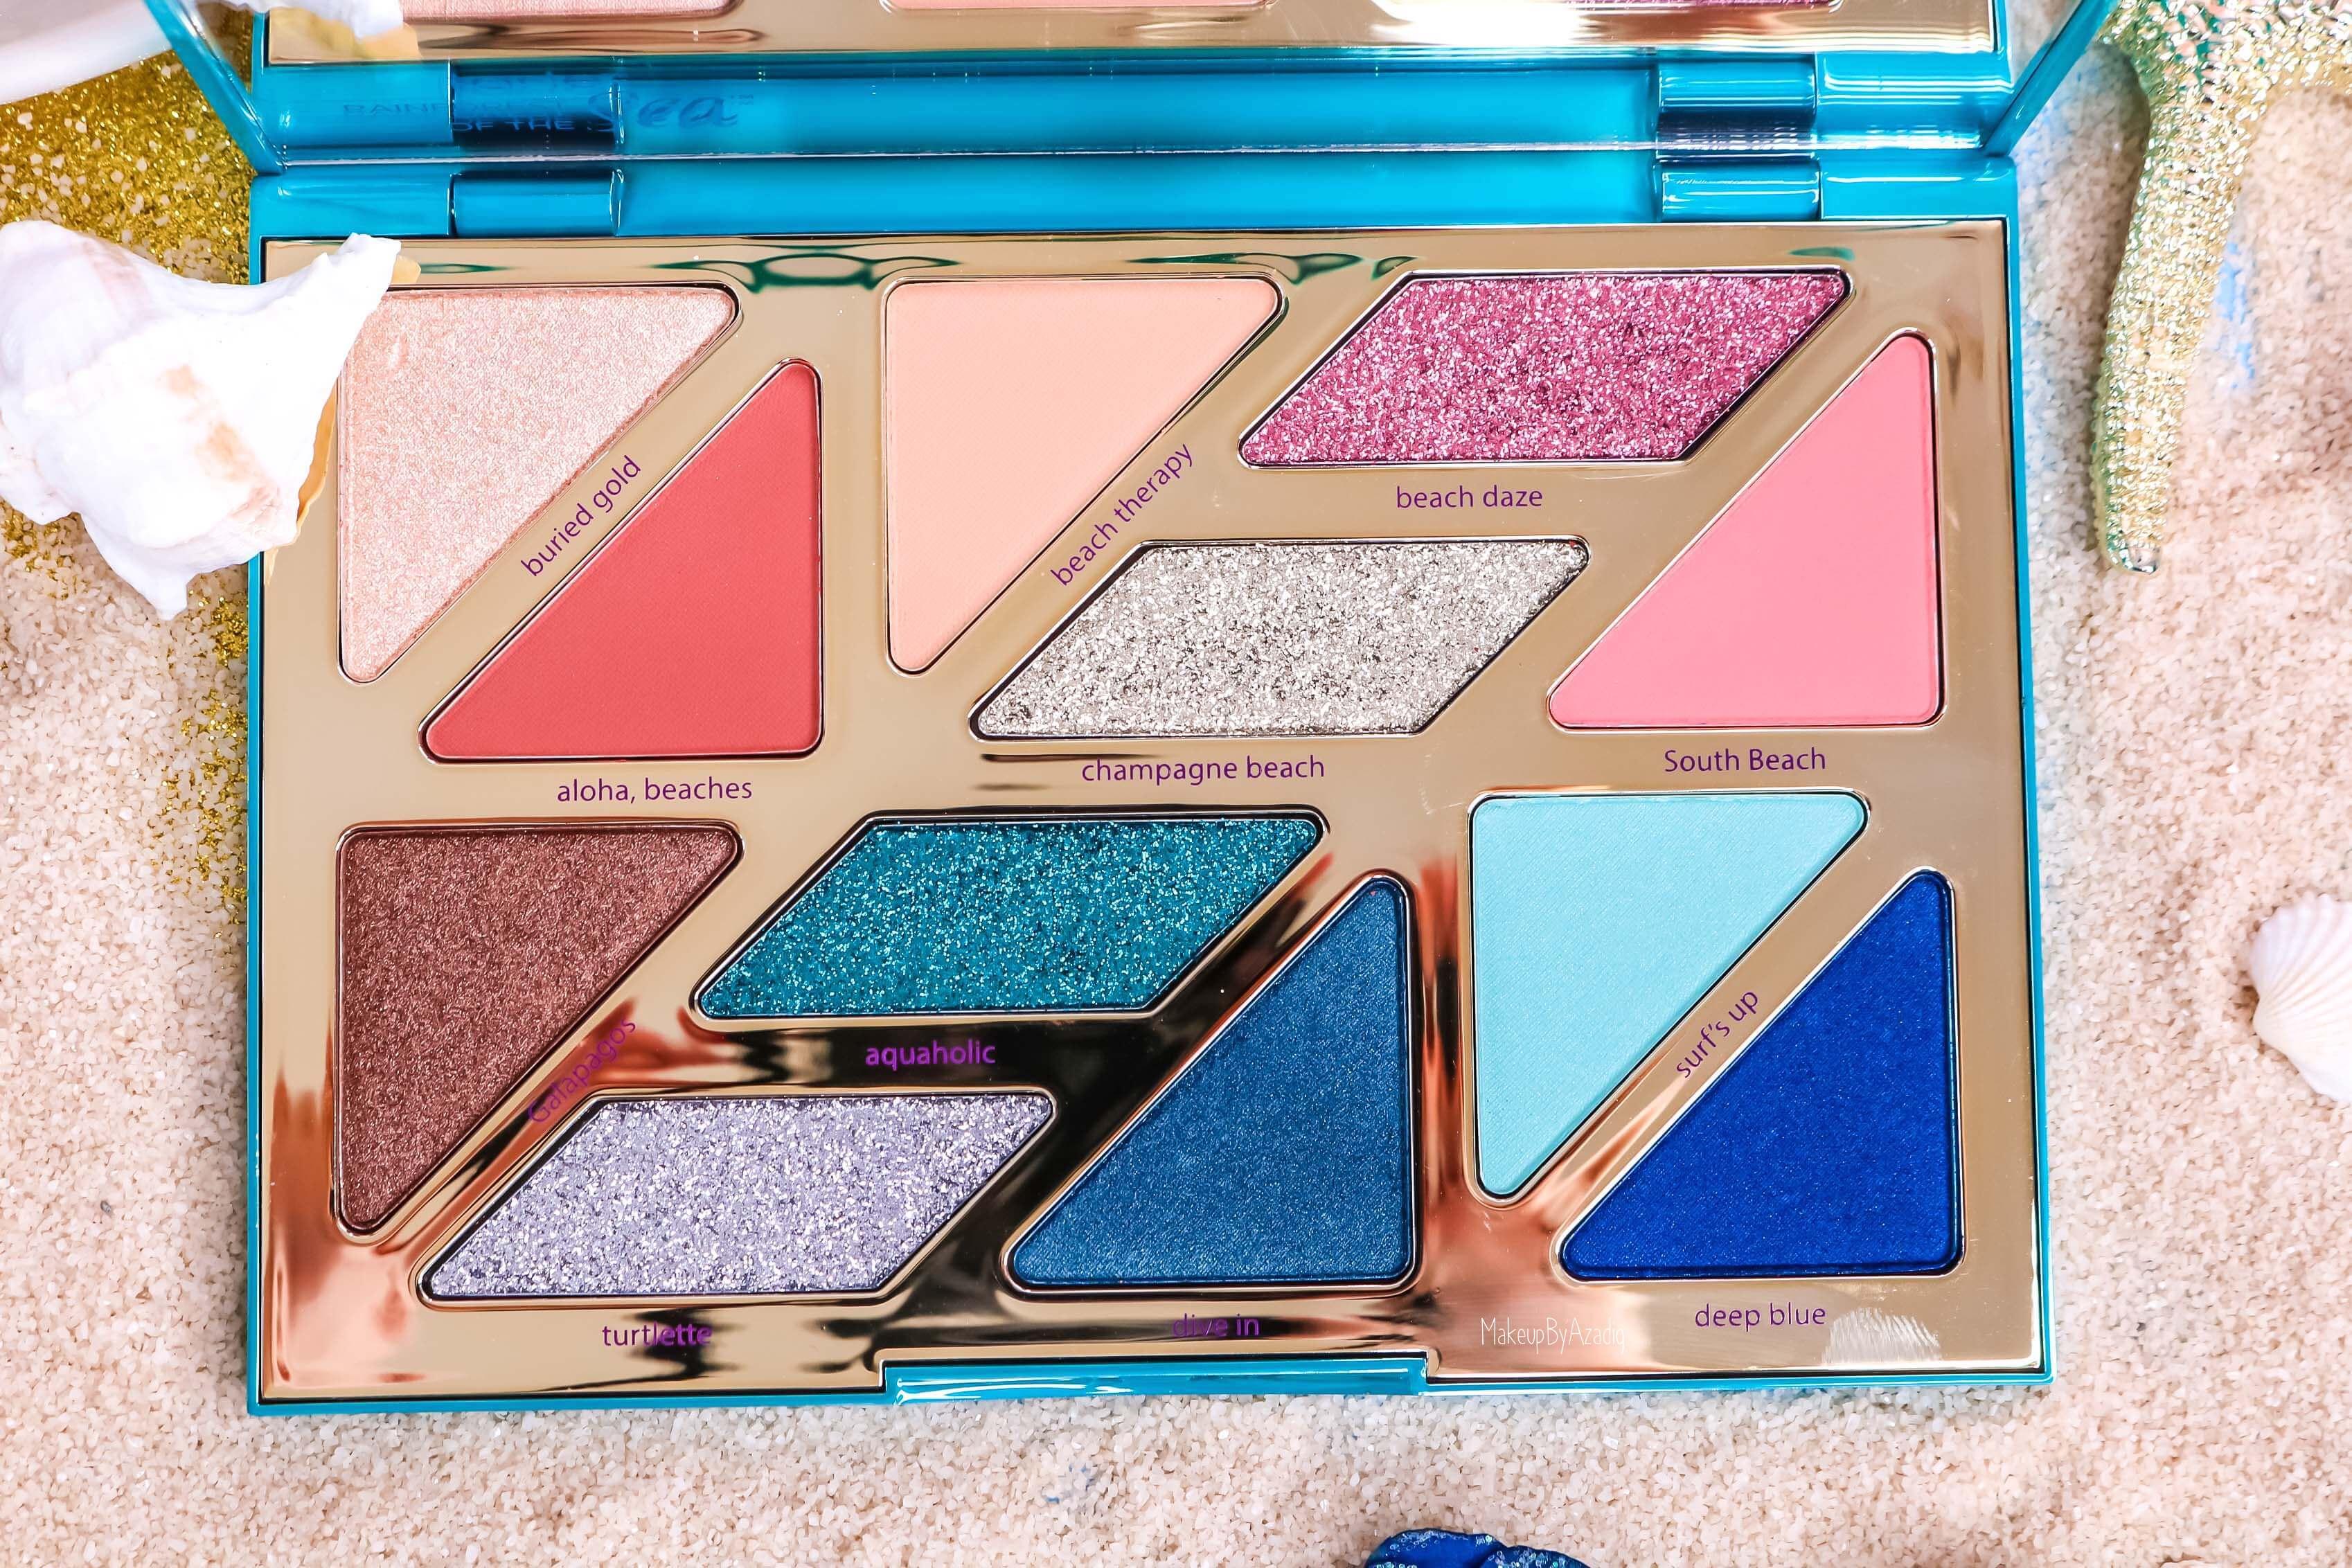 revue-palette-tarte-cosmetics-france-sephora-makeupbyazadig-swatch-prix-avis-rainforest-of-the-sea-couleurs